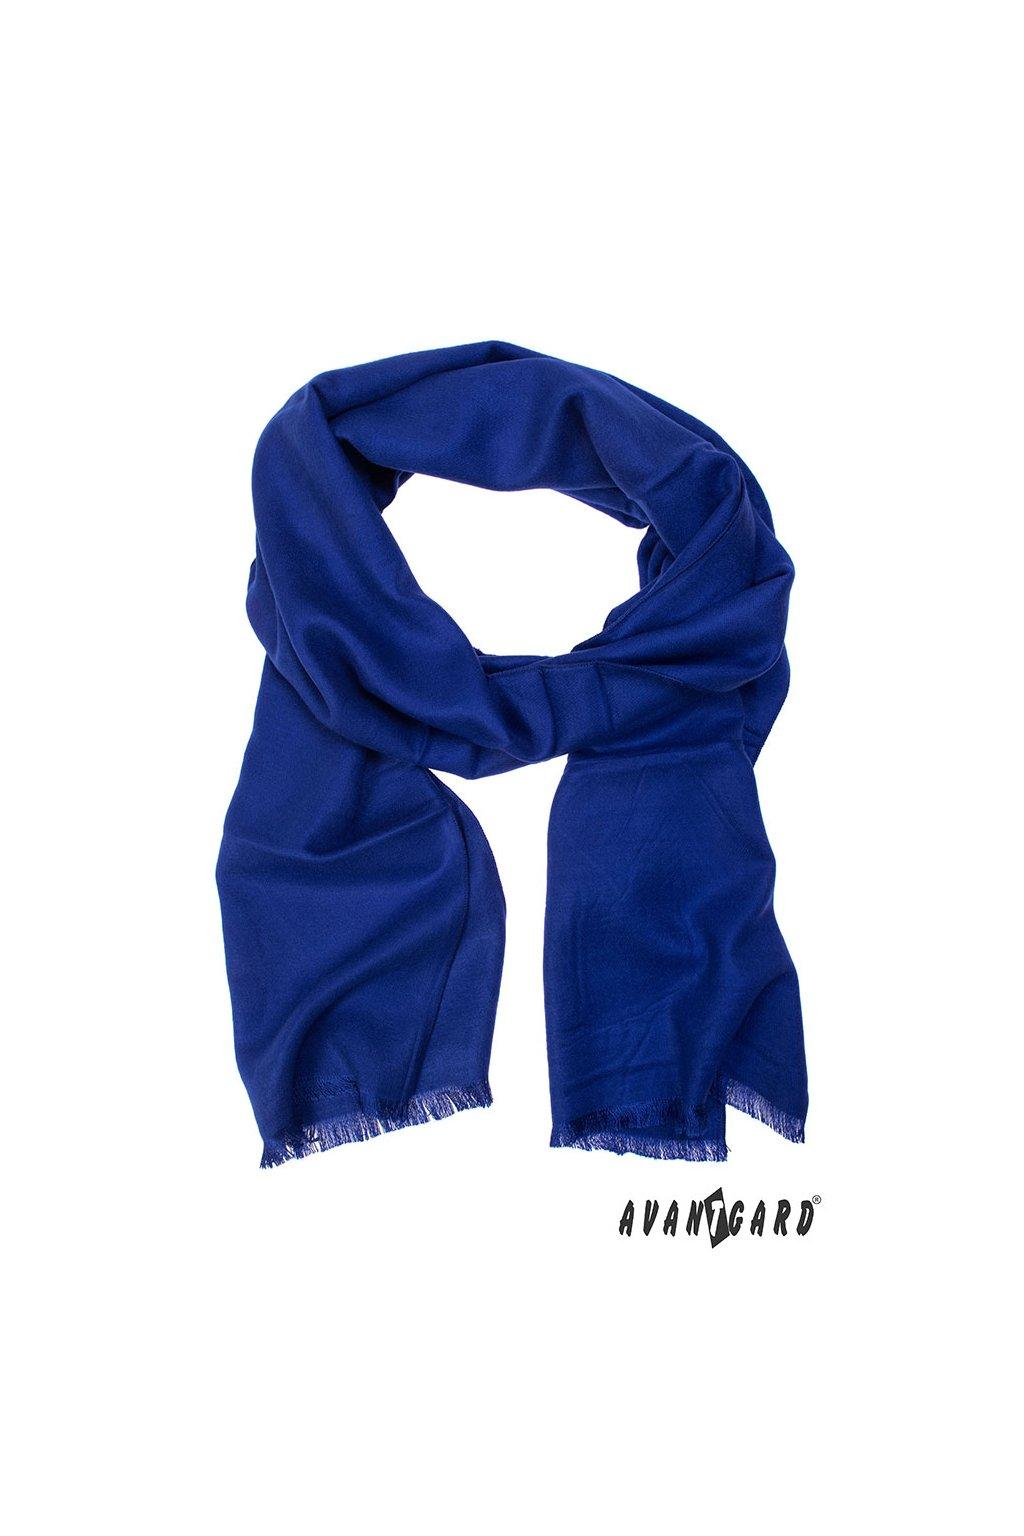 Šála modrá 957 - 01552